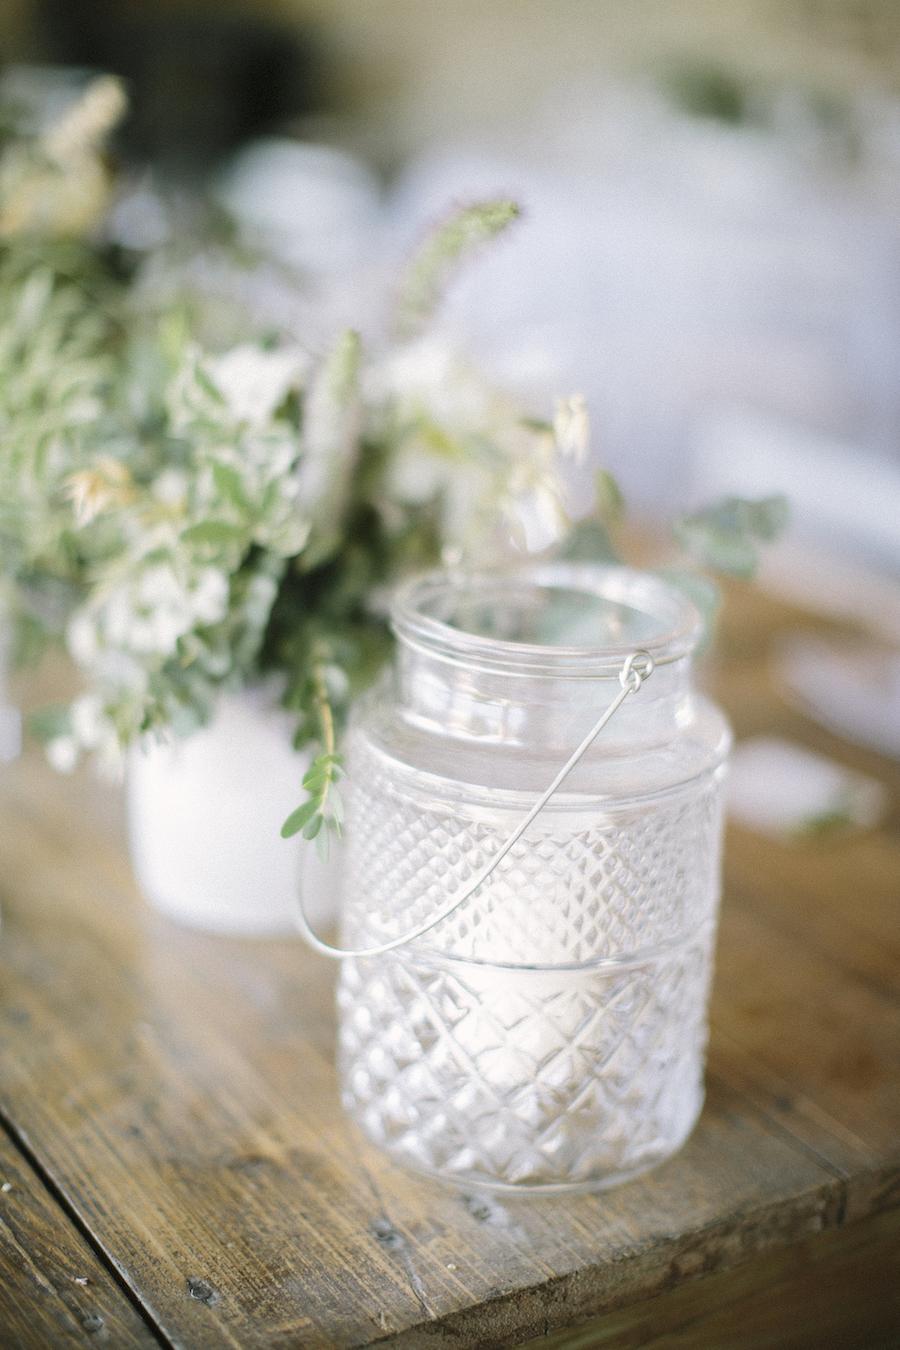 saya-photography-rustic-french-wedding-provence-domaines-de-patras-59.jpg